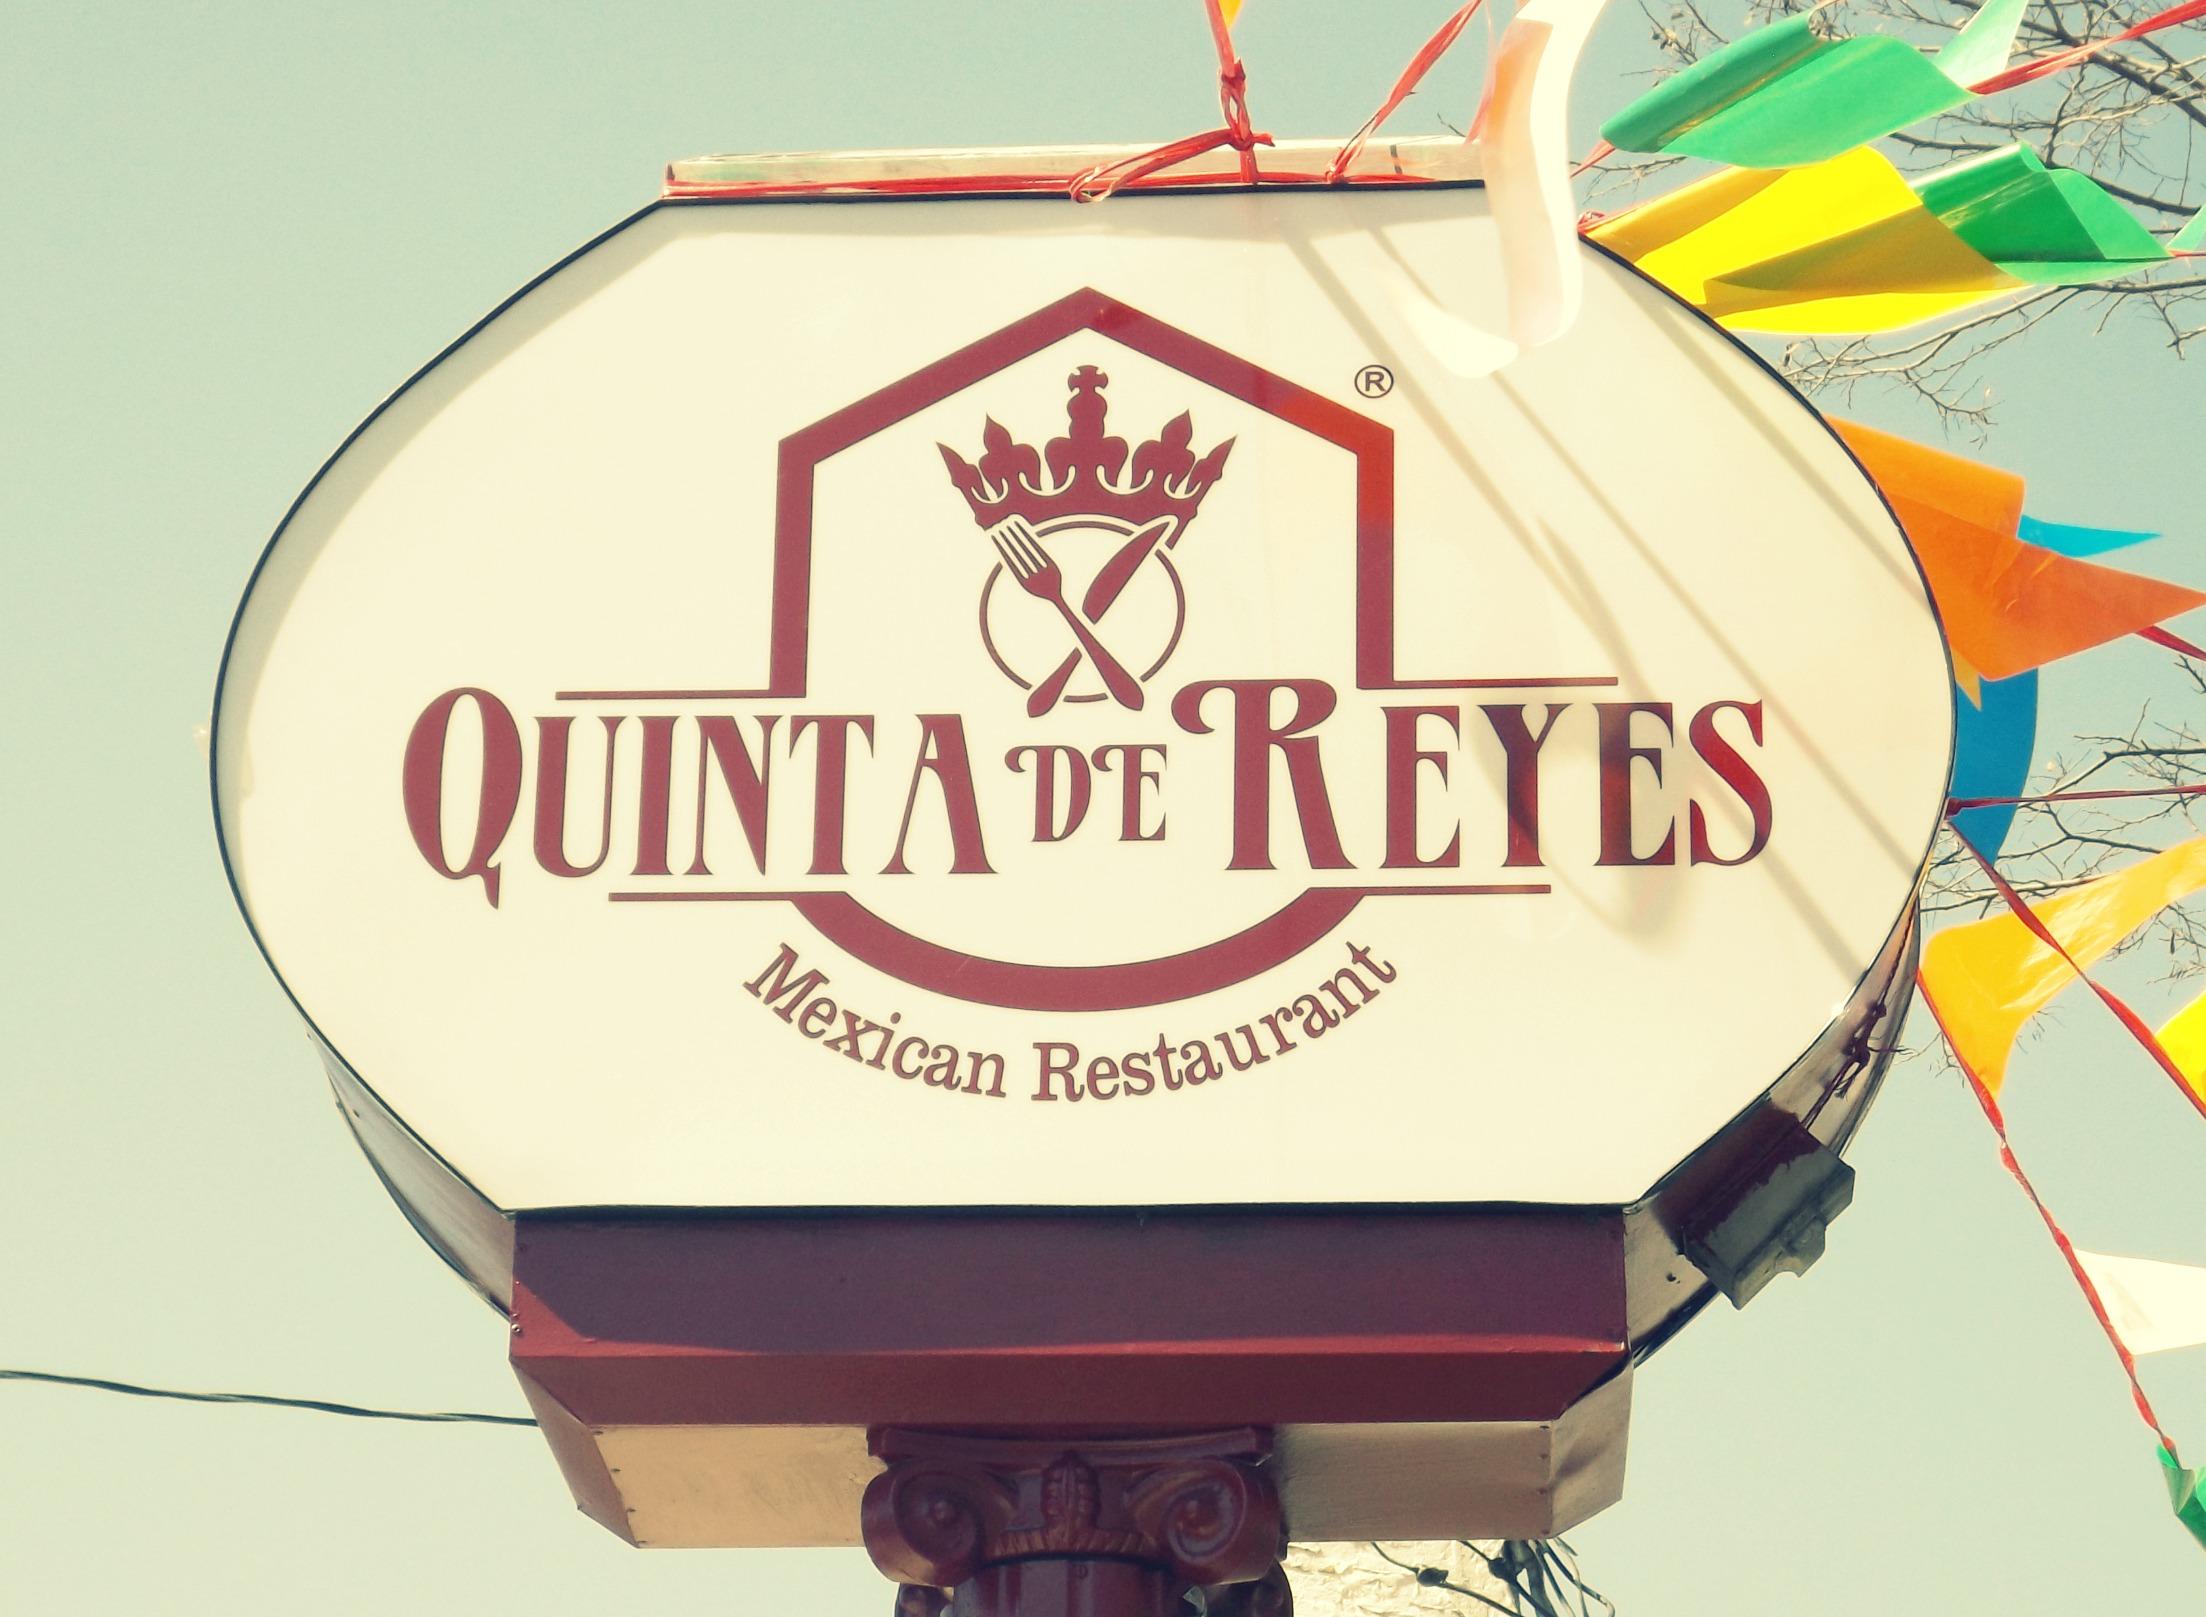 La Quinta de Reyes Restaurant